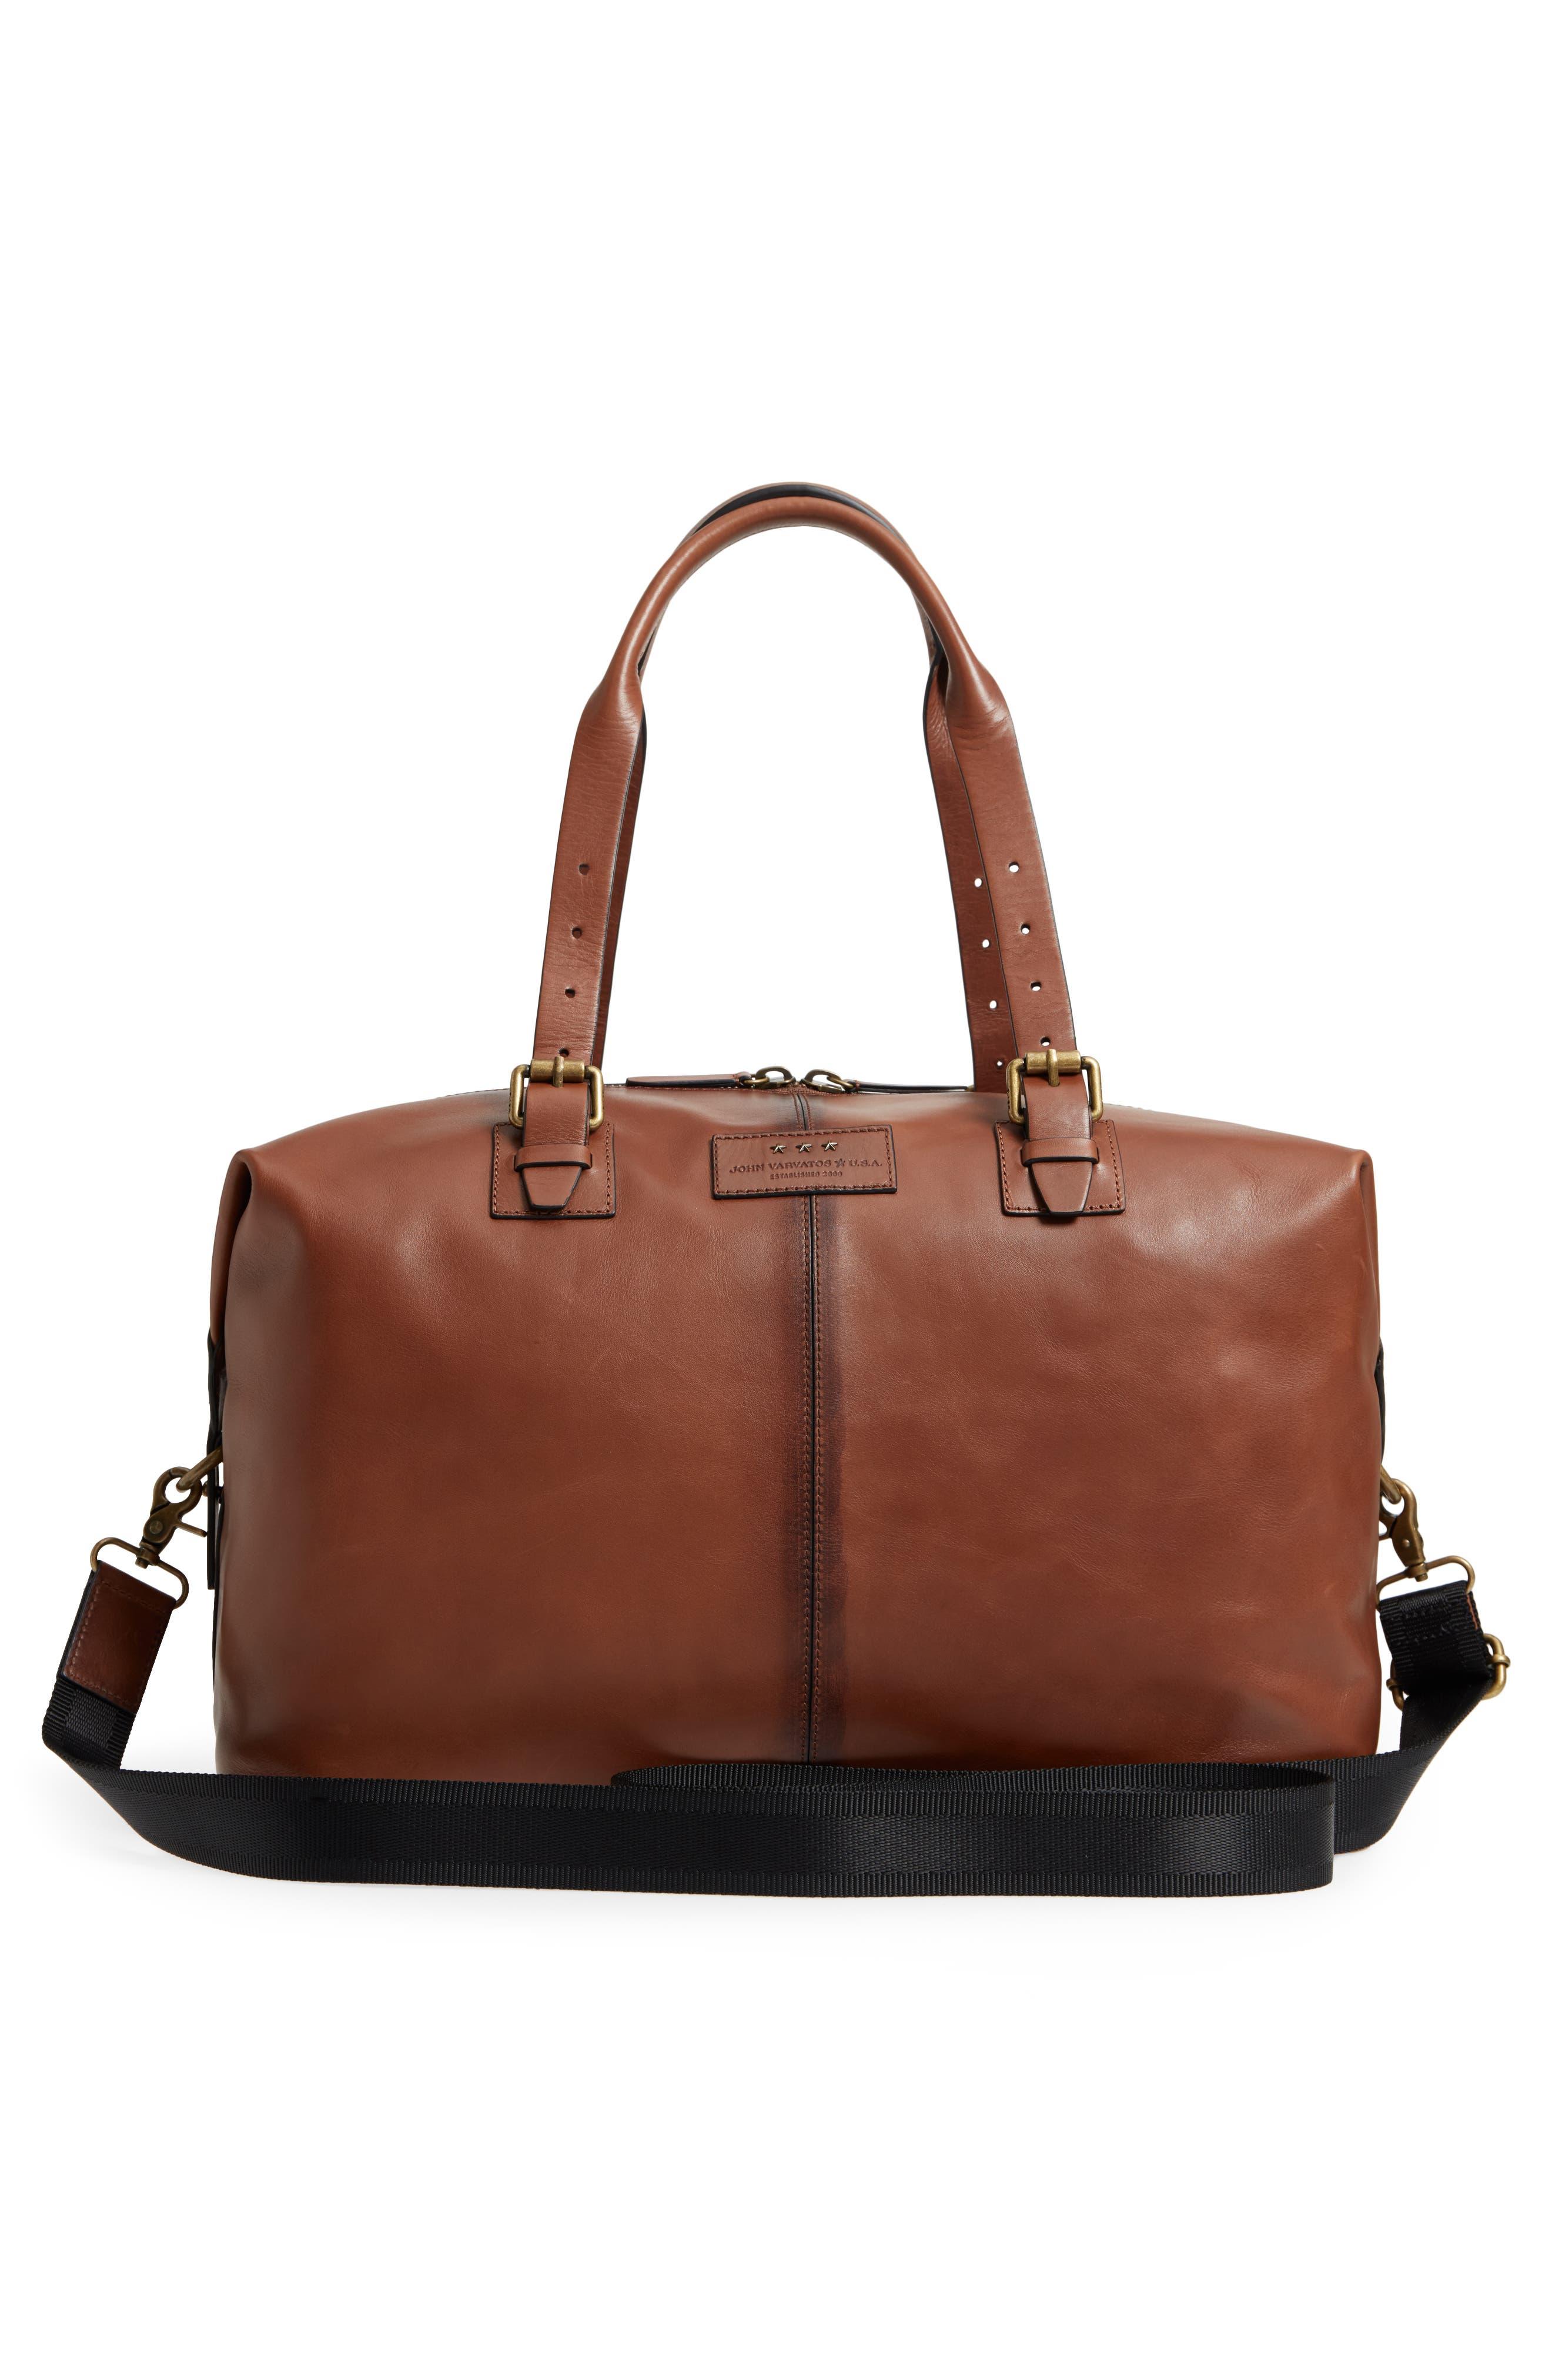 Heritage Leather Duffel Bag,                             Alternate thumbnail 3, color,                             200